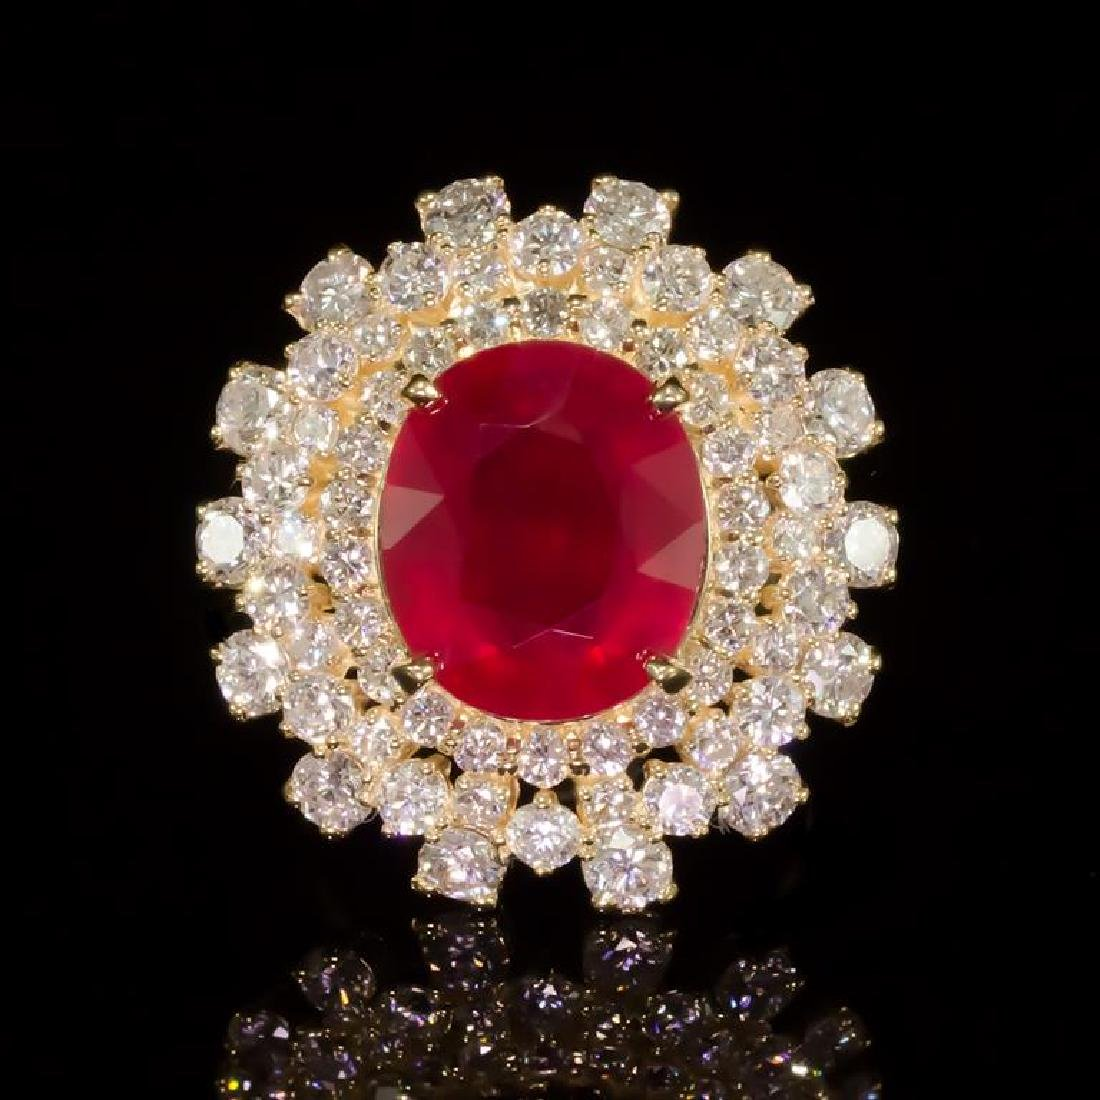 14K Gold 9.39ct Ruby 3.93ct Diamond Ring